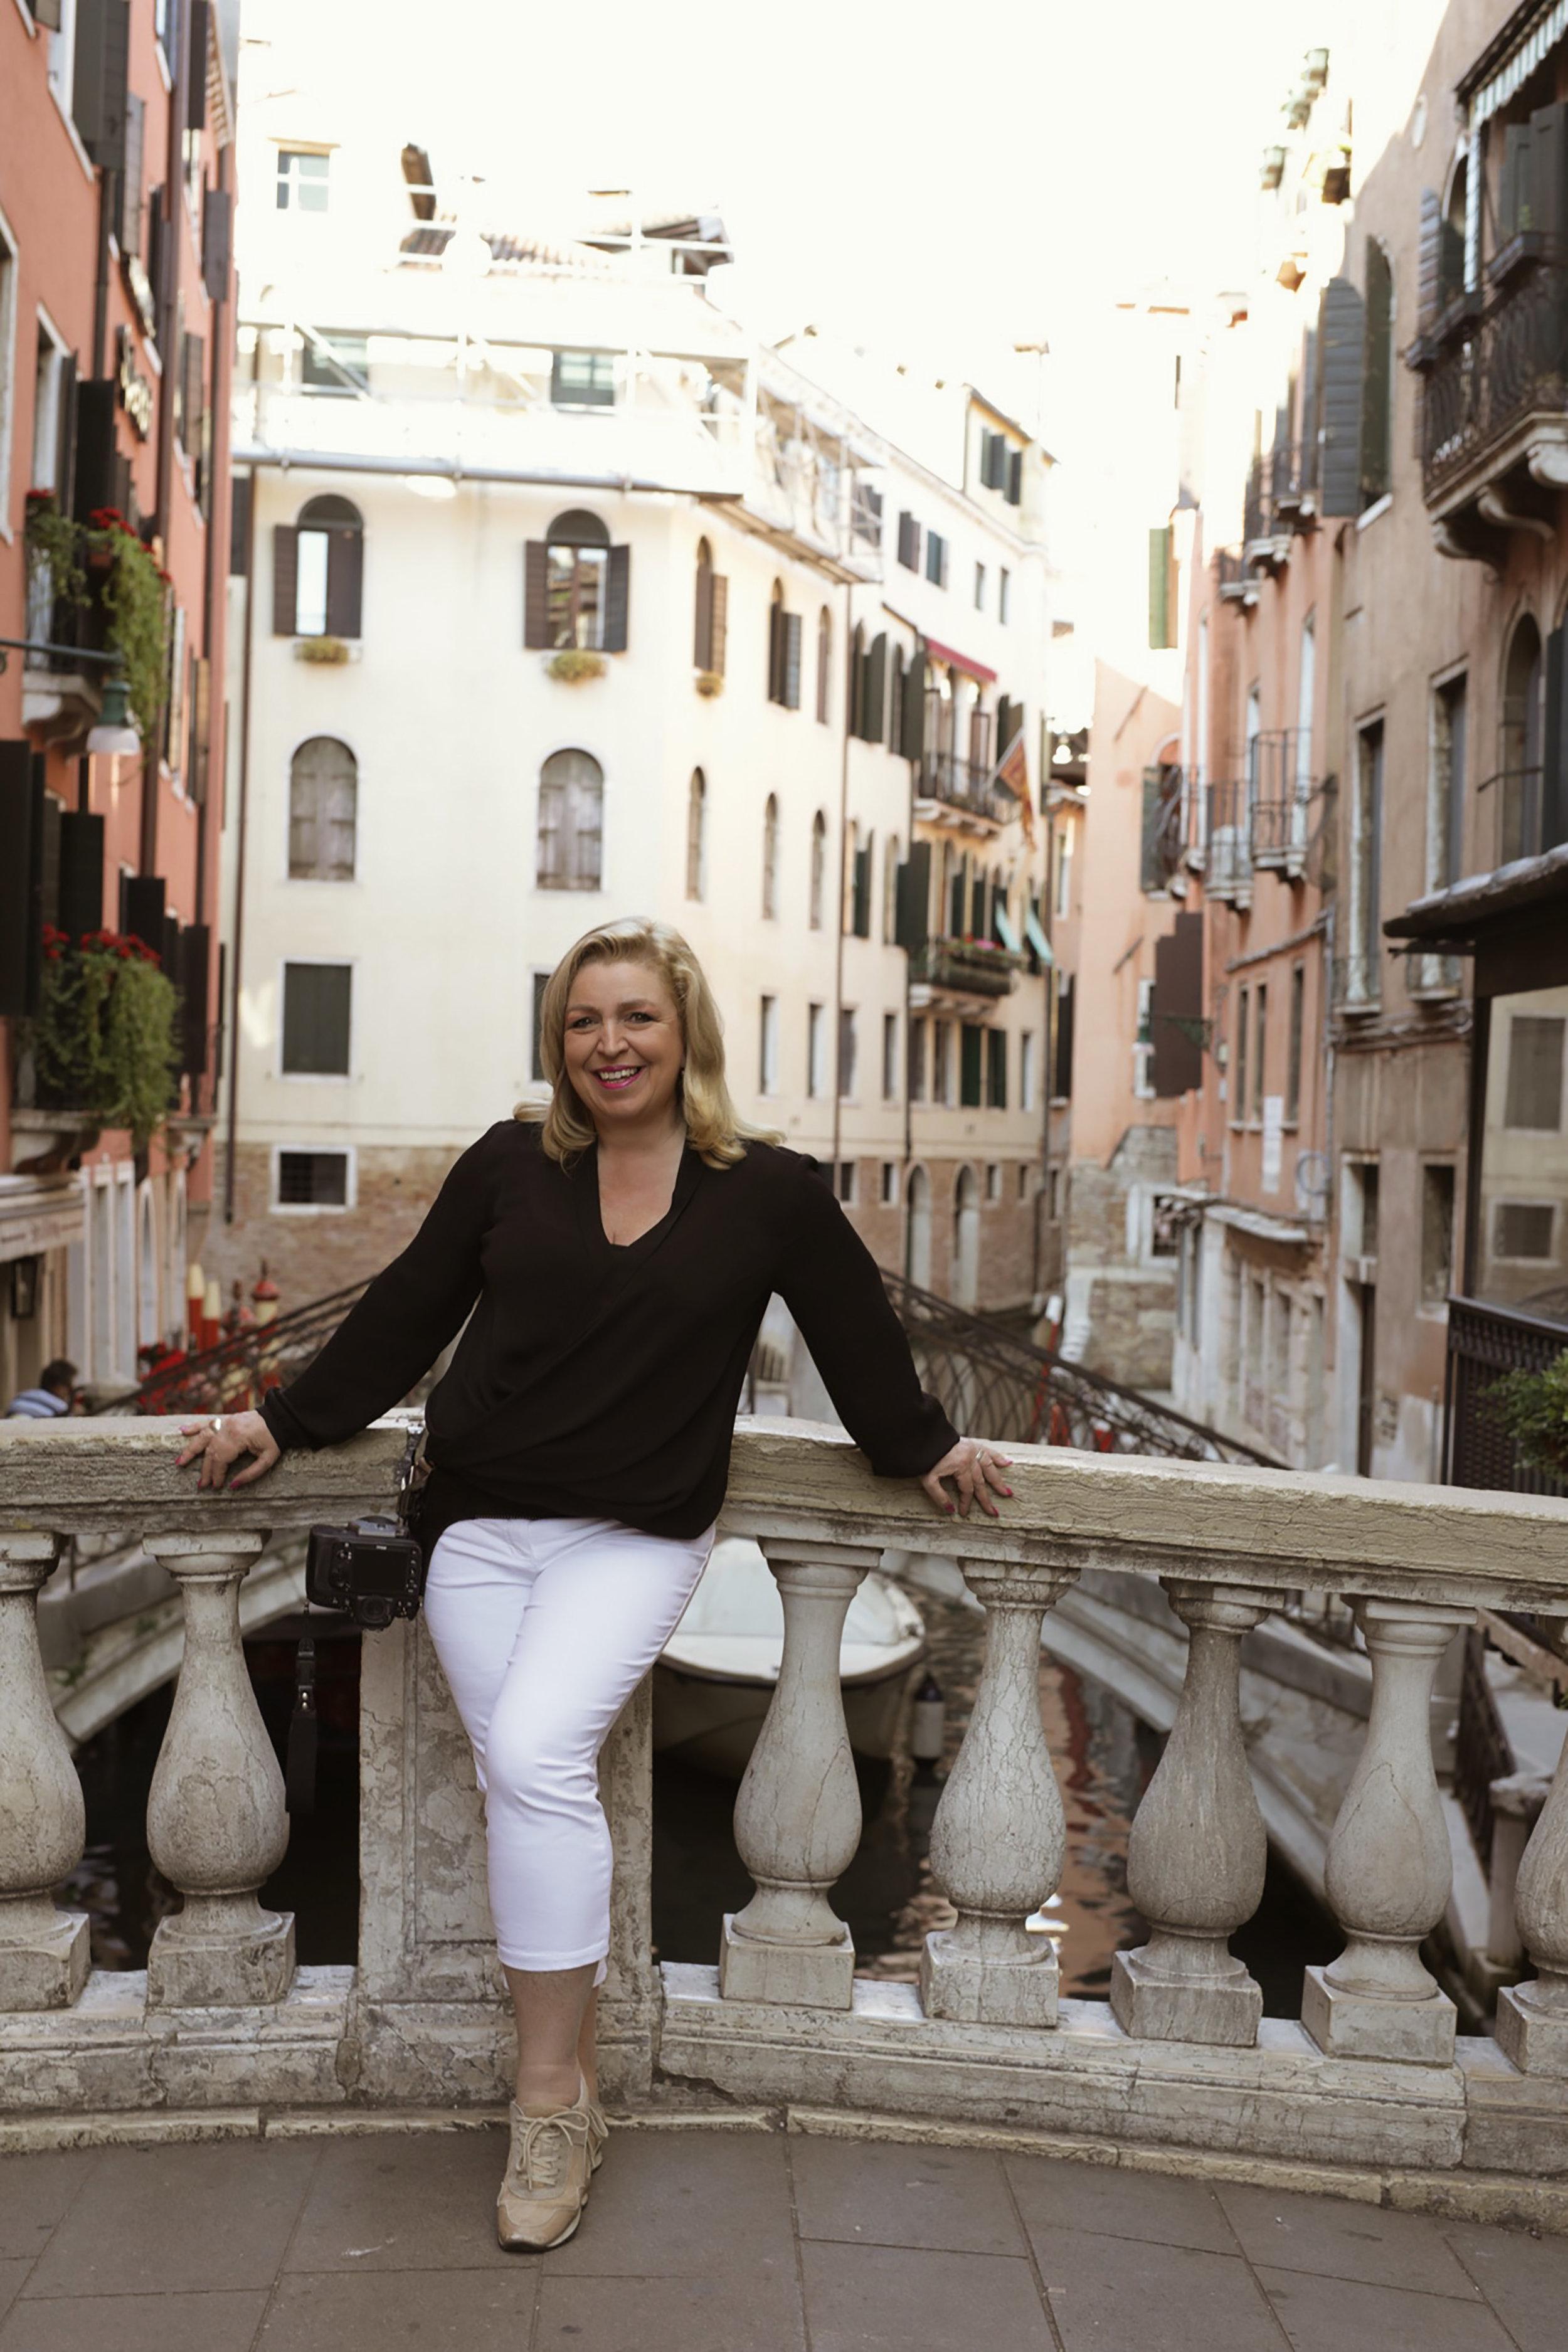 branding for photographers - portrait - destination - travel - Venice Italy